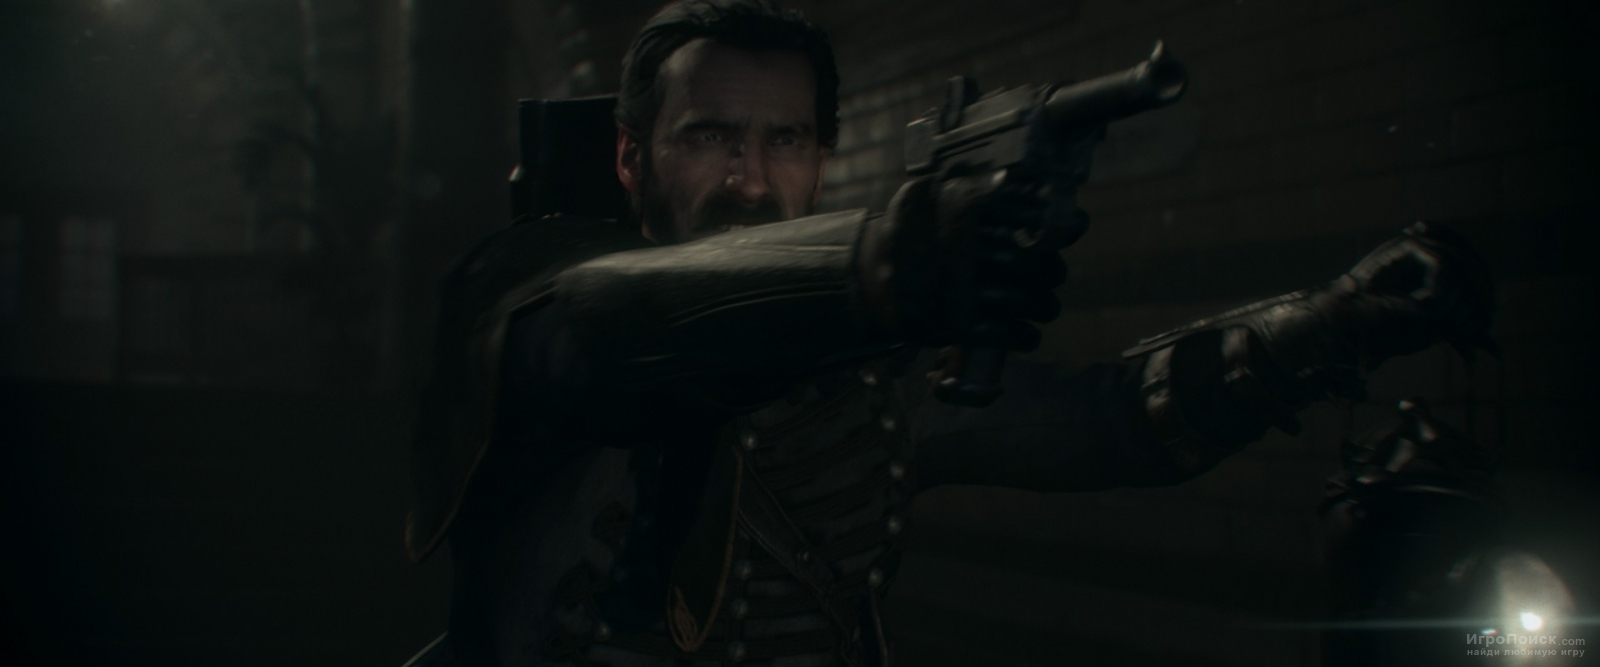 Скриншот к игре The Order: 1886